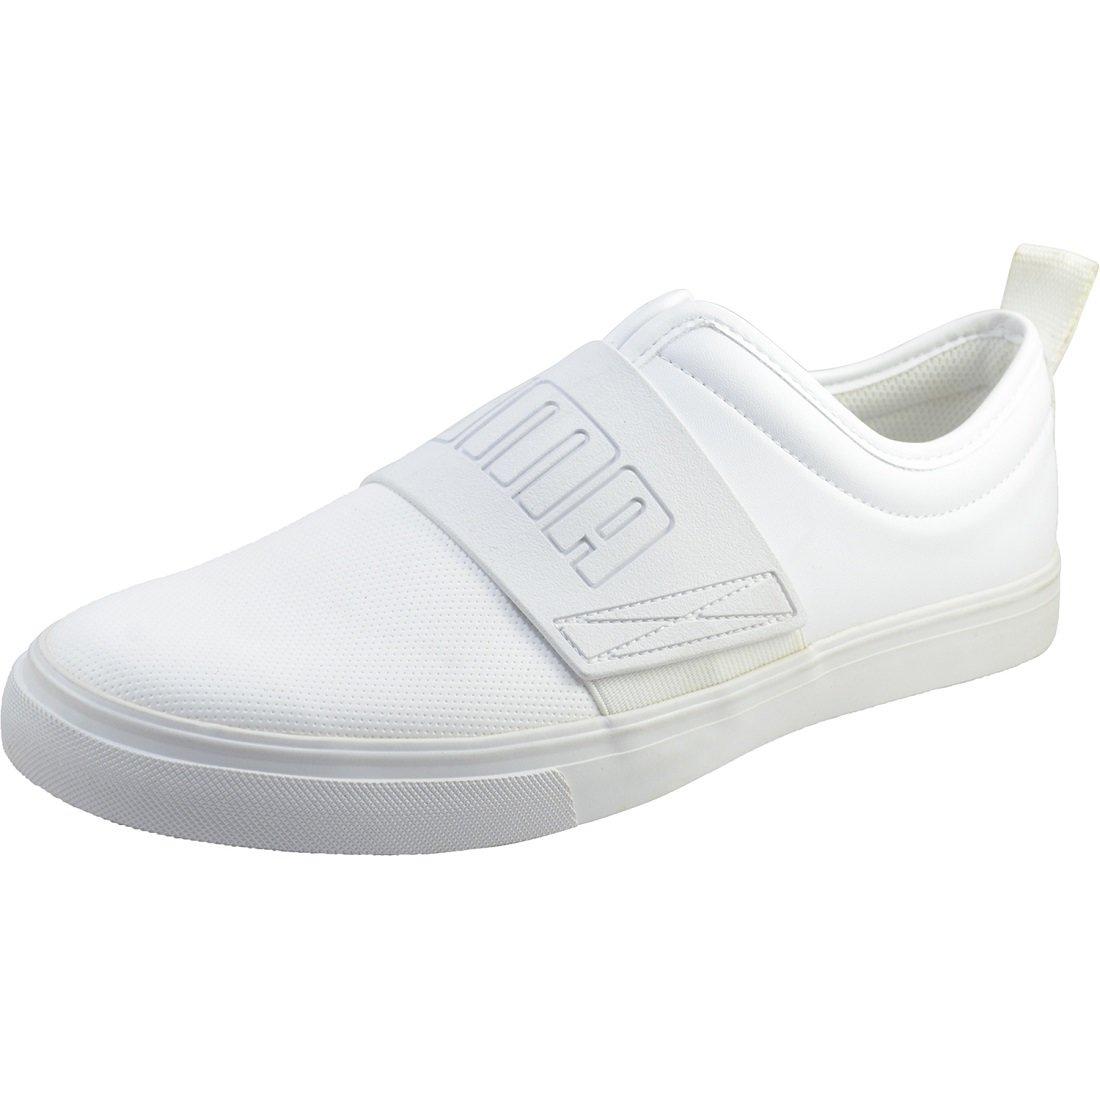 Buy Puma Unisex's El Rey Fun Sneakers